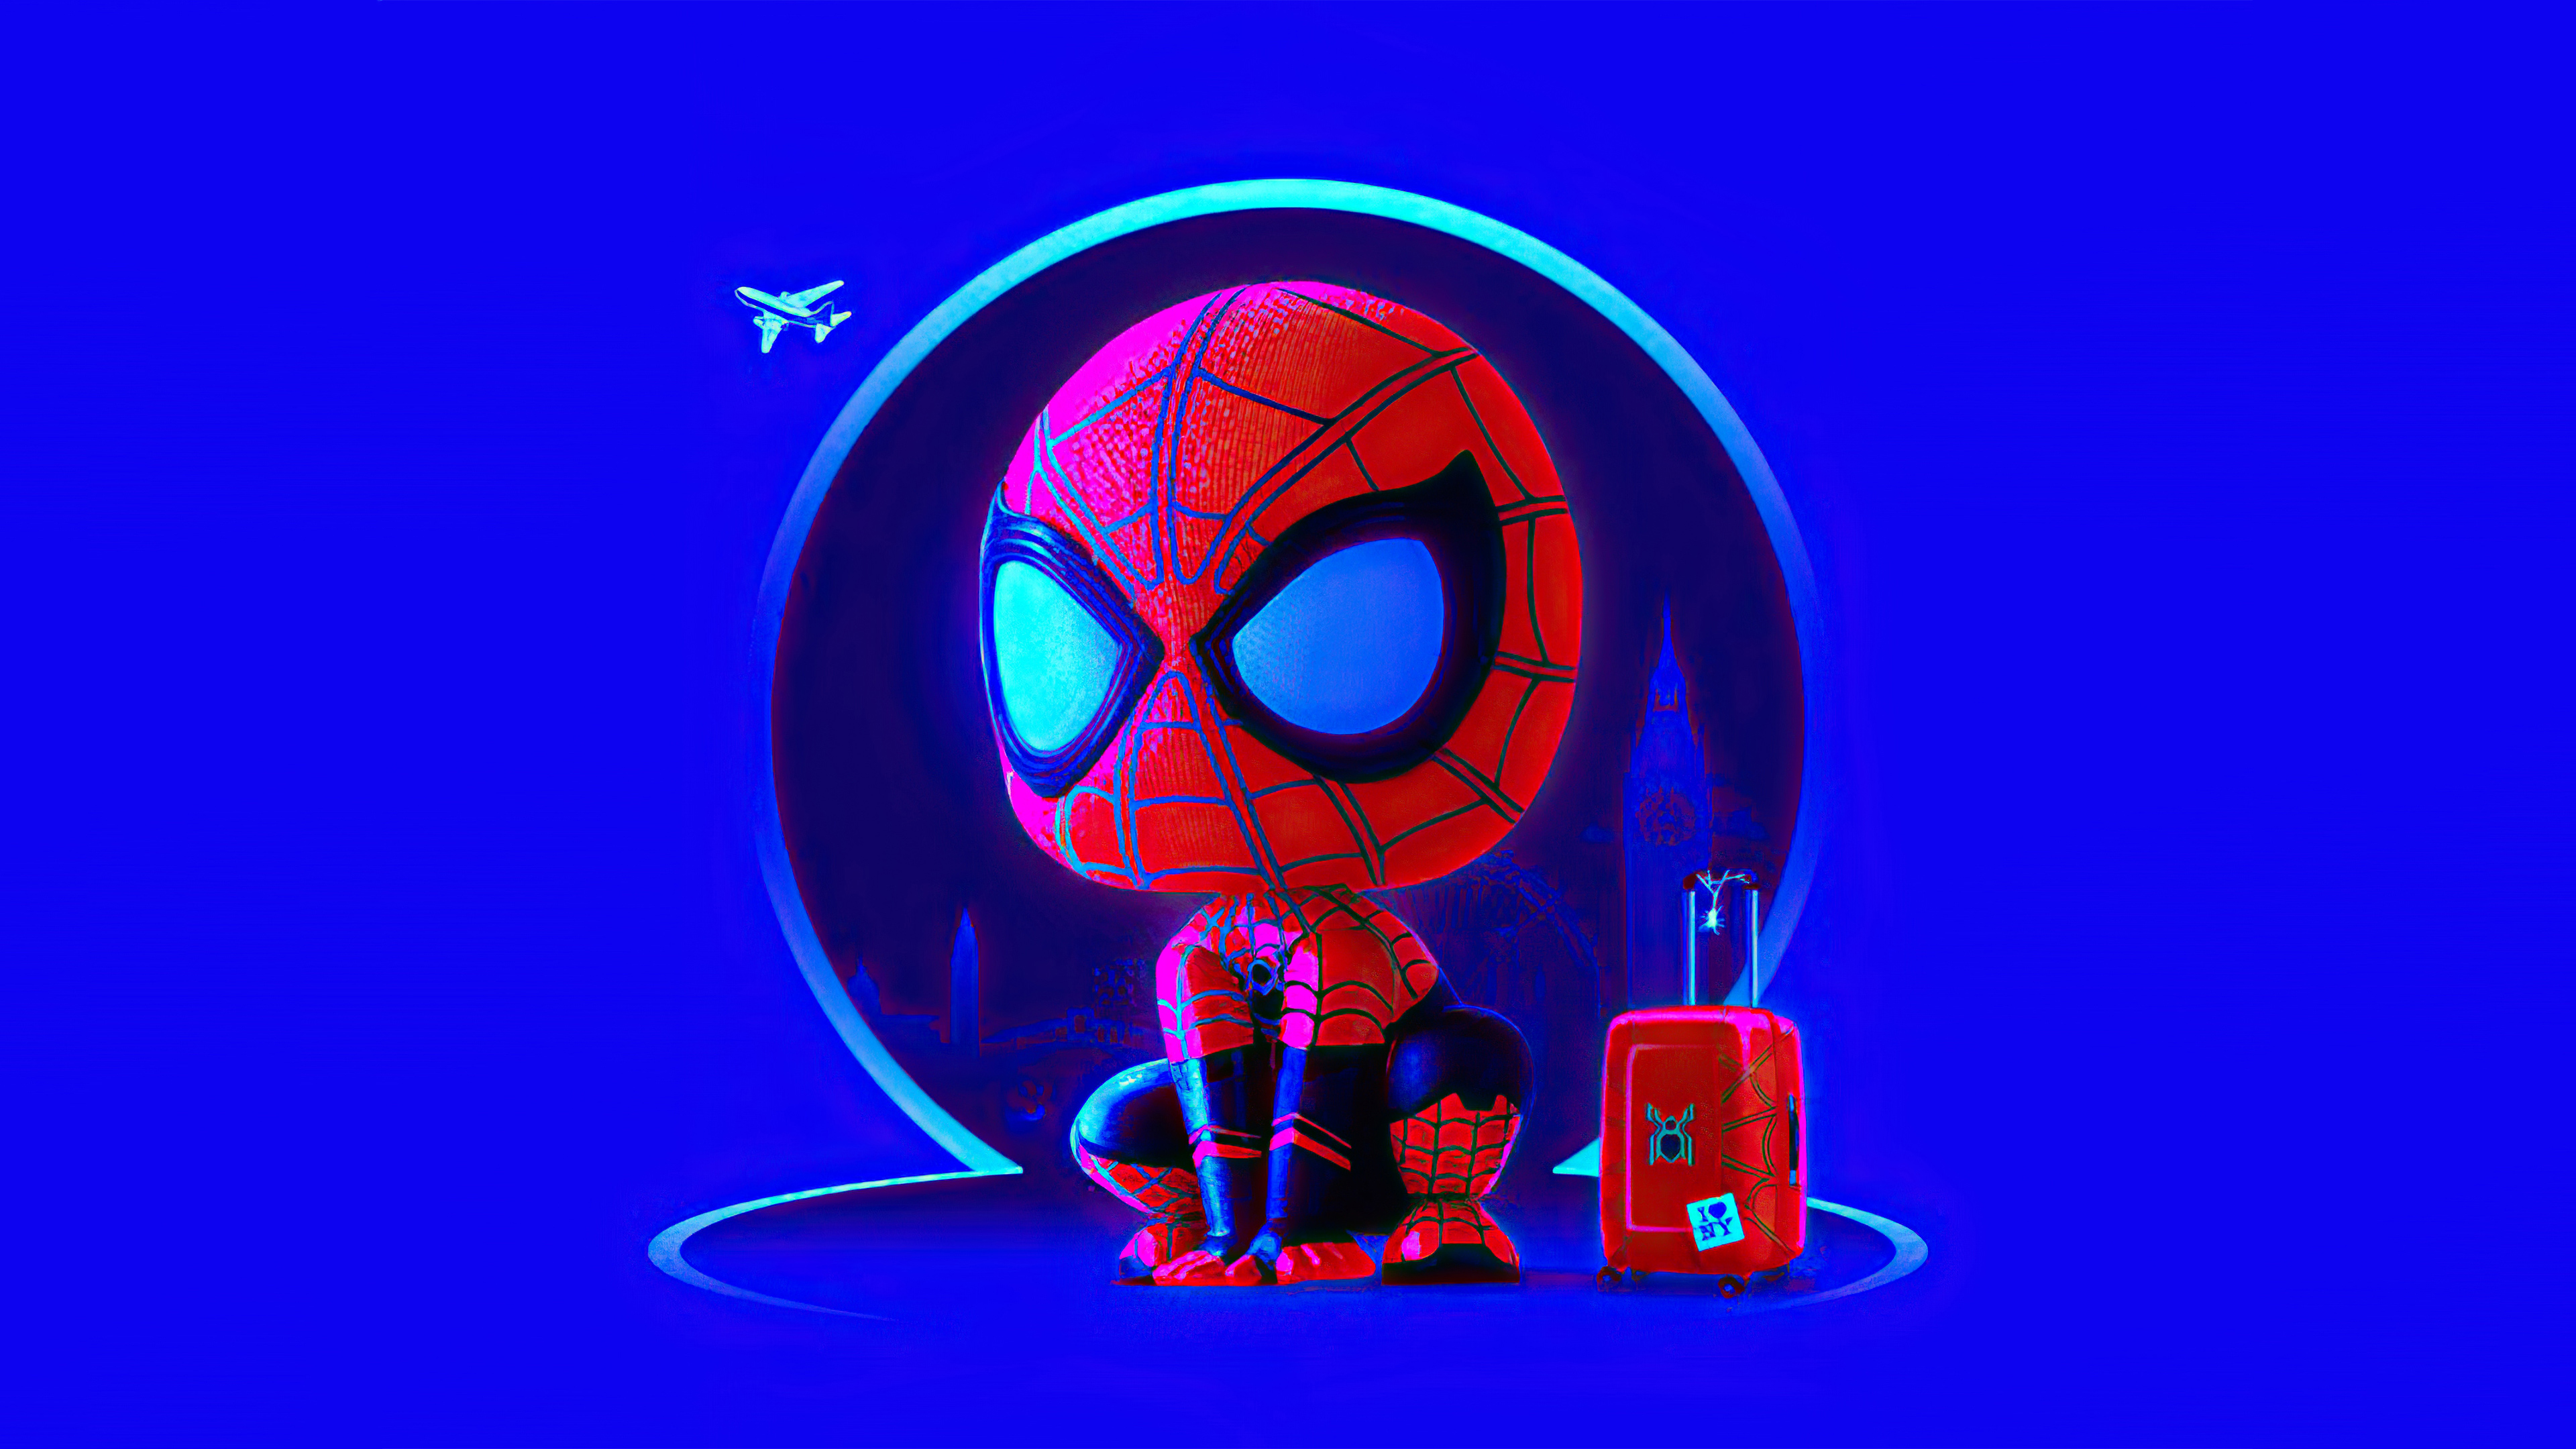 Fondos de pantalla El hombre araña Arte digital